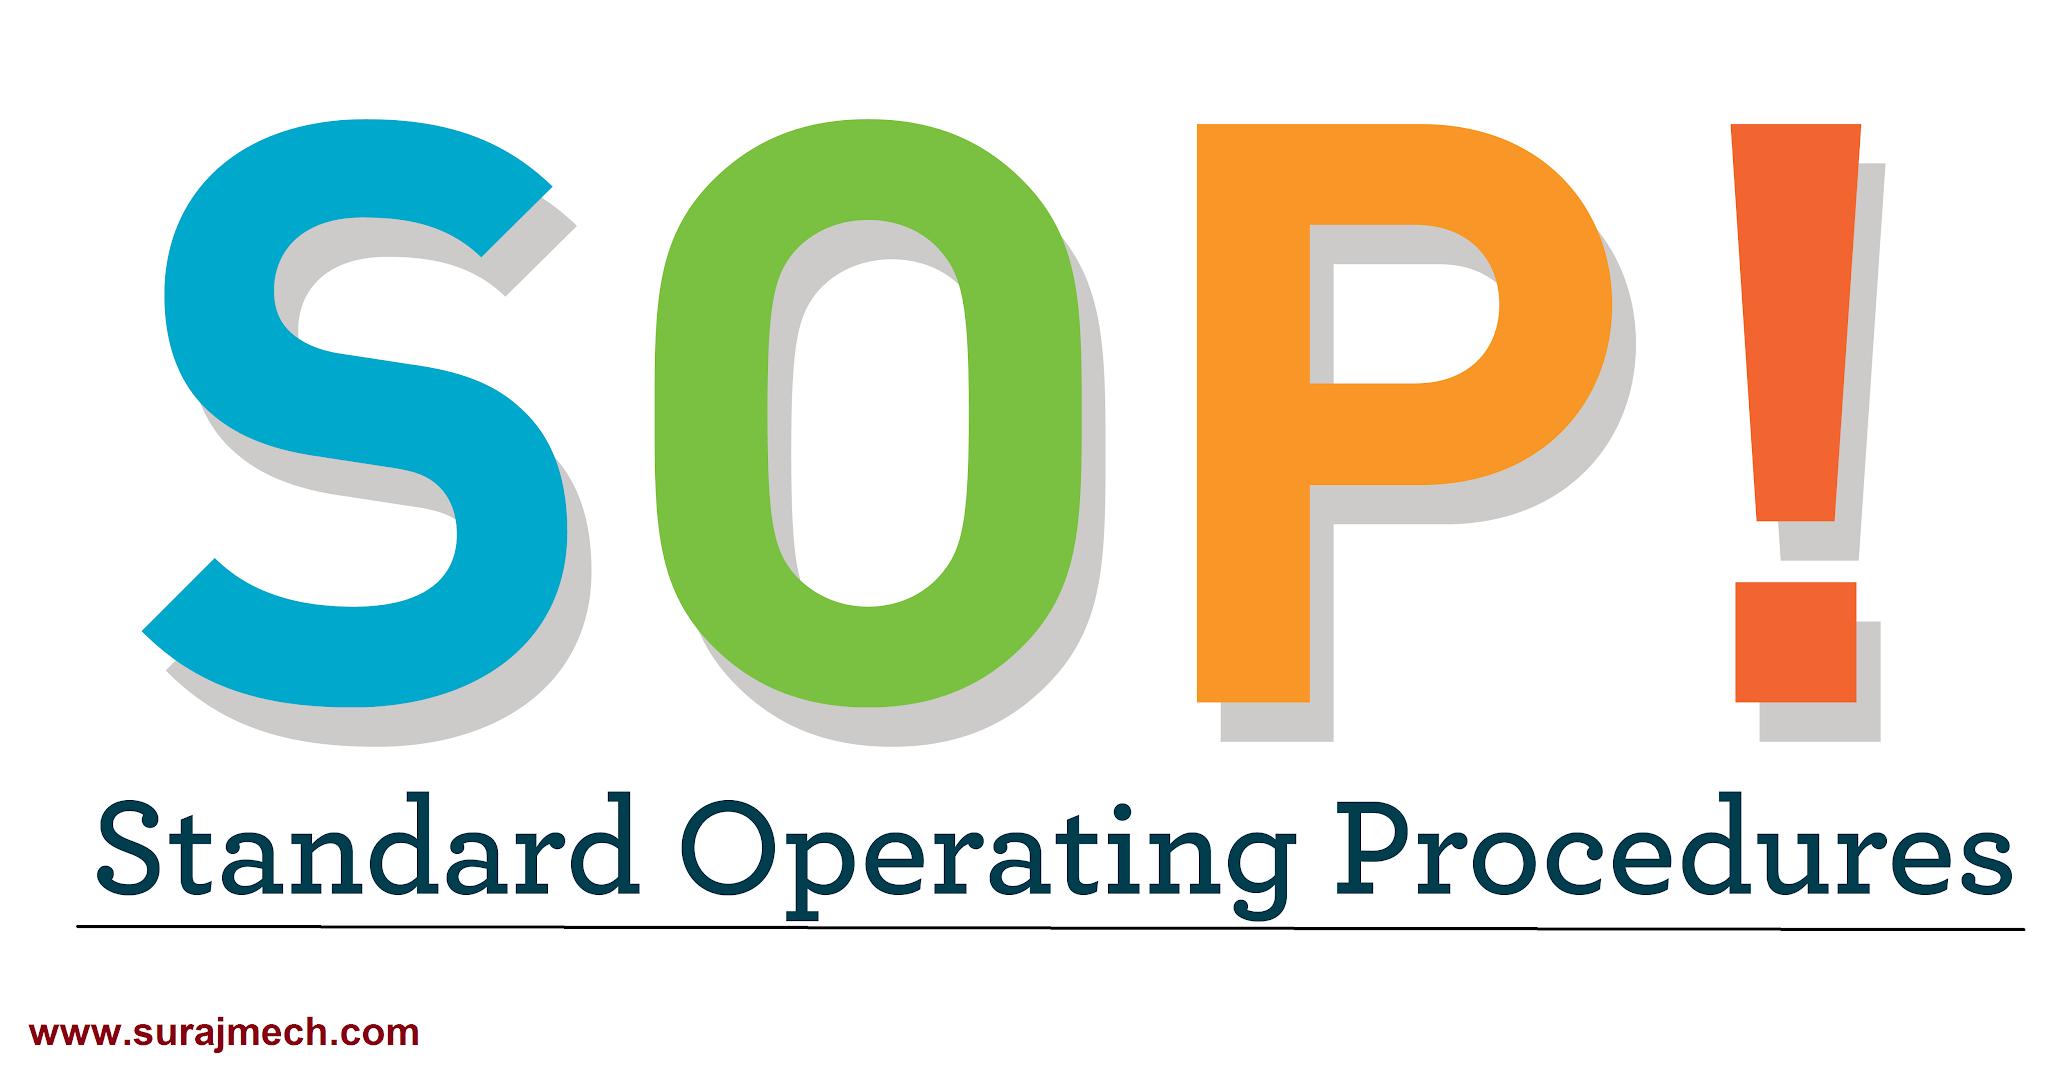 What is SOP / Standard Operating Procedure